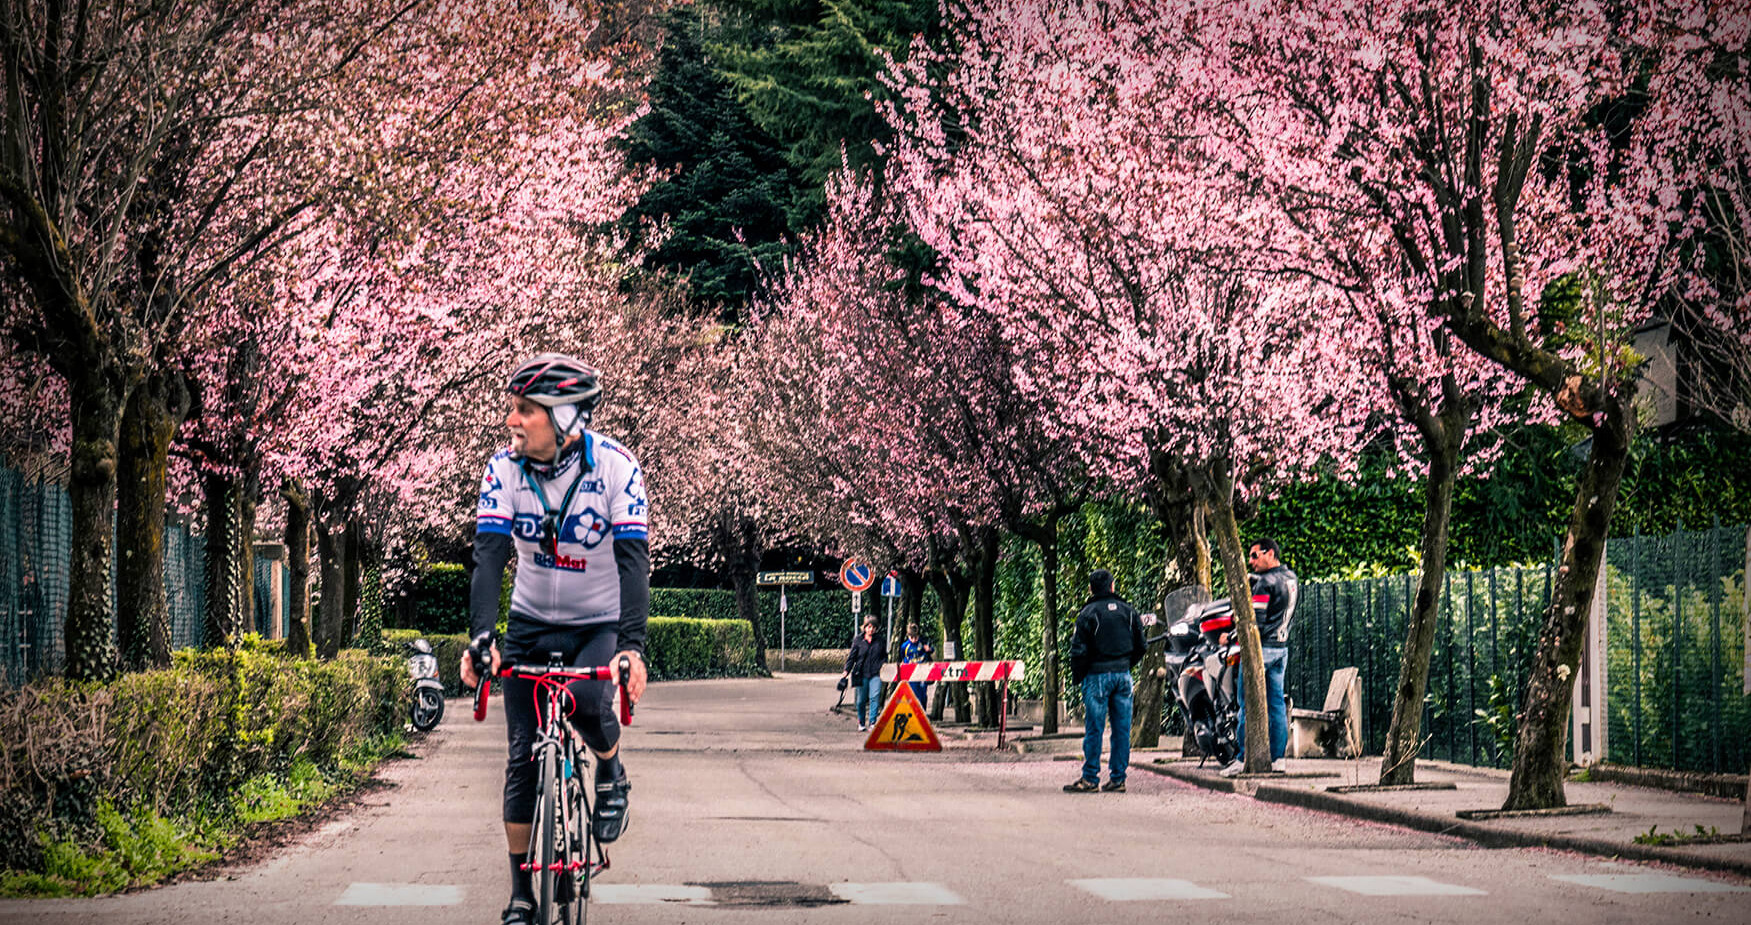 inda bike pink trees.jpg